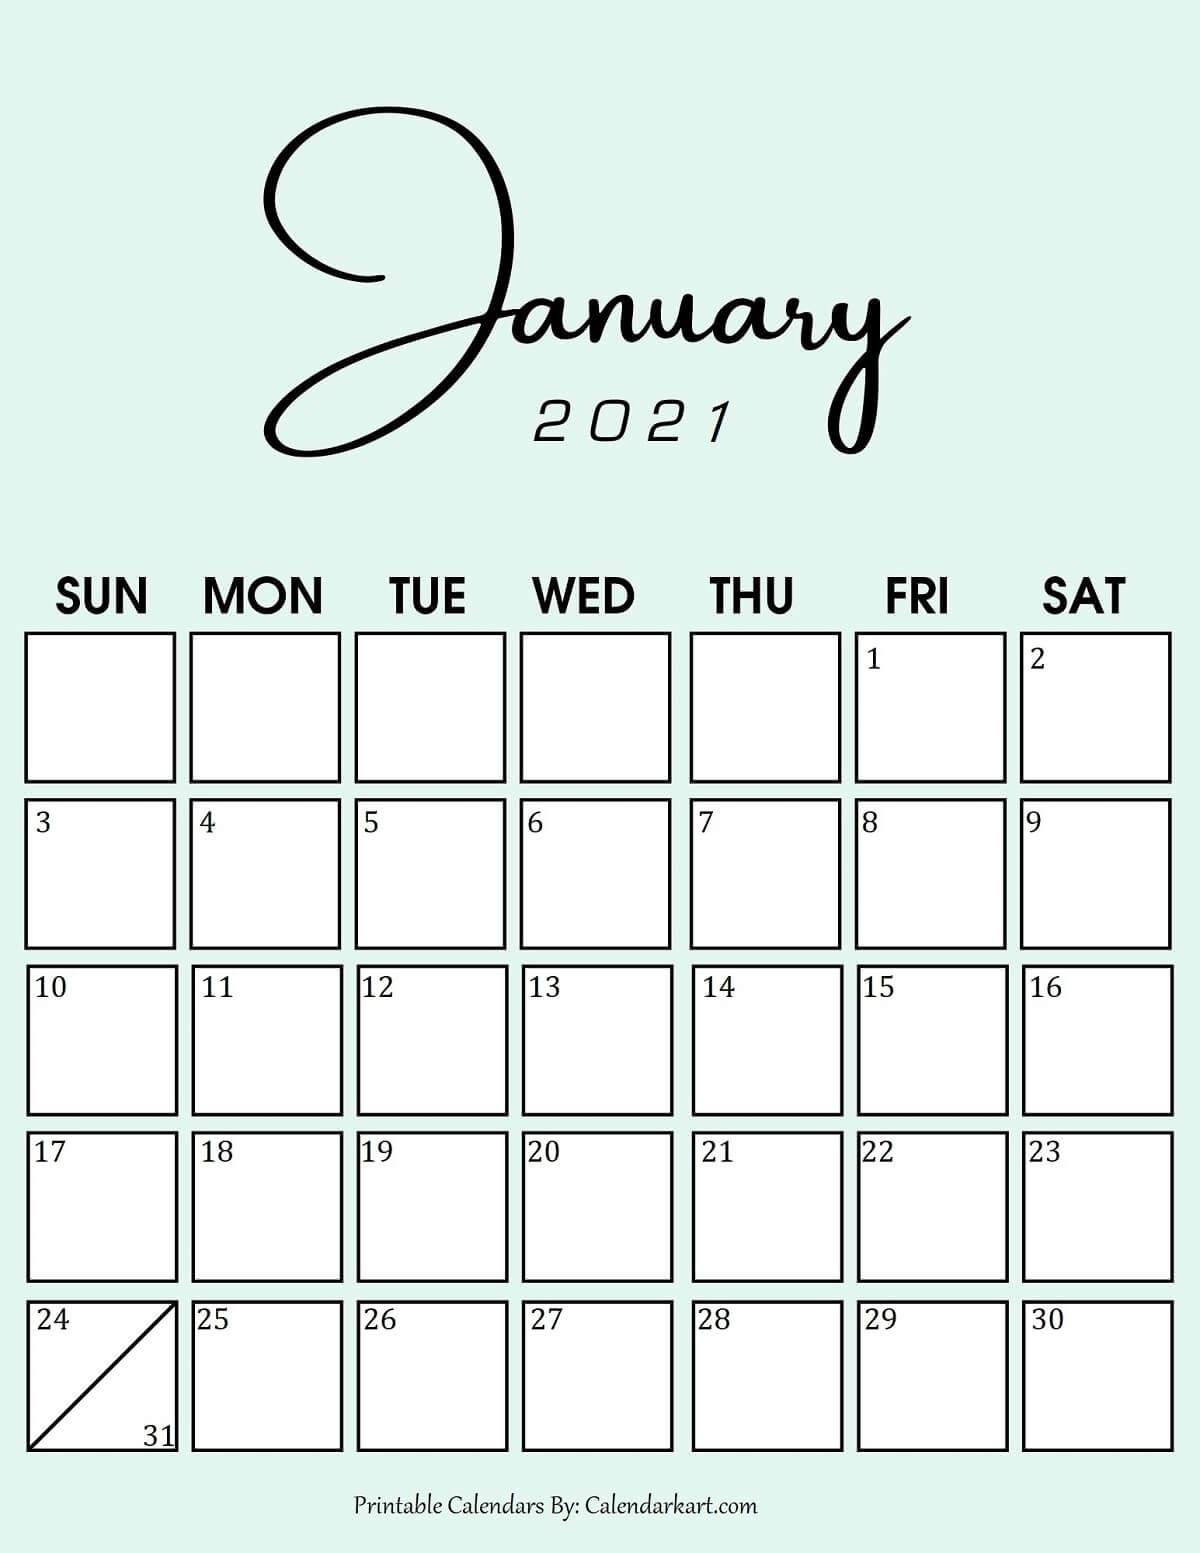 7 Cute And Stylish Free Printable January 2021 Calendar